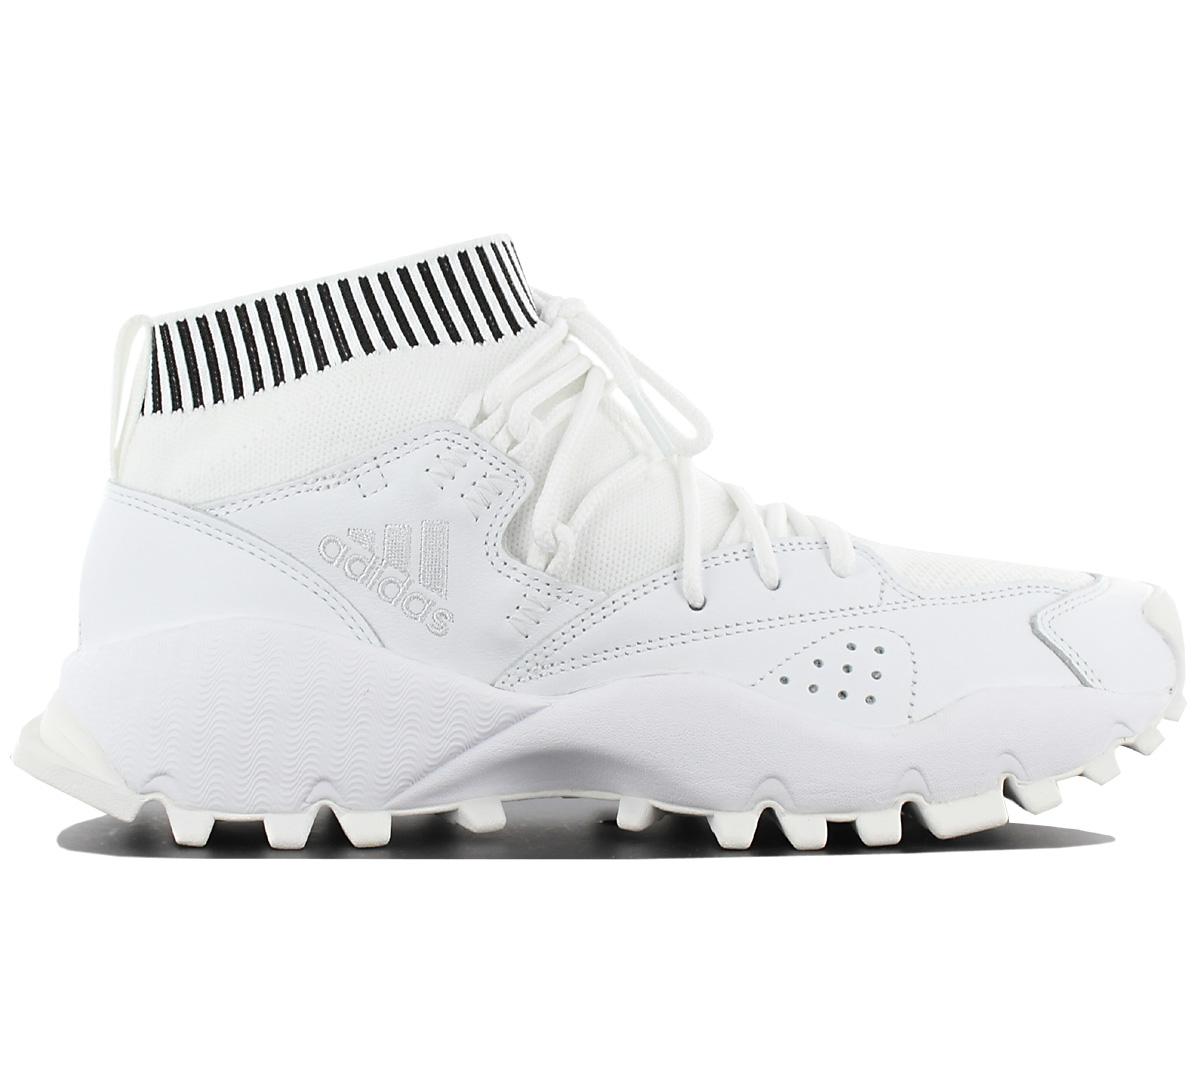 Details zu adidas Originals Seeulater PK Primeknit Herren Sneaker Weiß Schuhe S80040 NEU